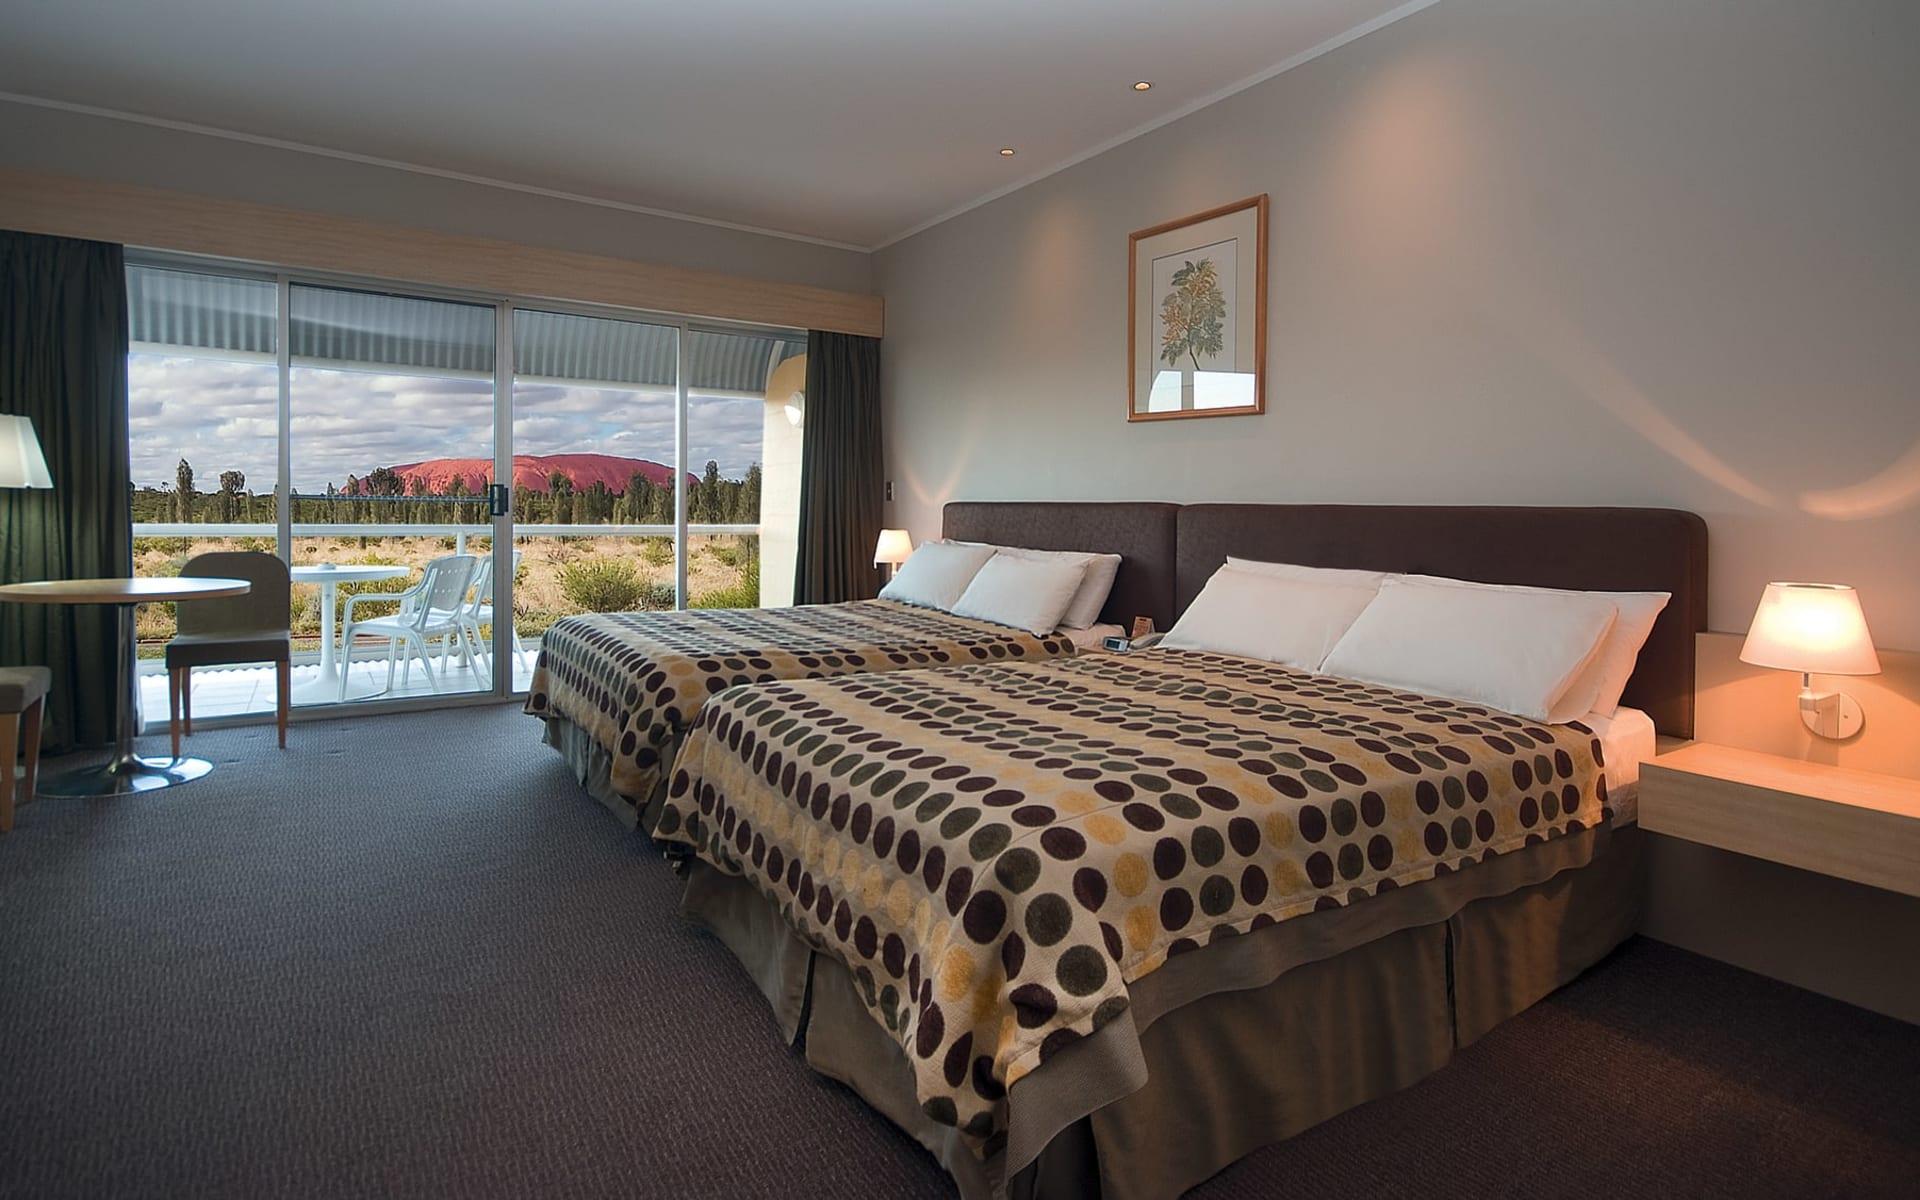 Desert Gardens Hotel in Ayers Rock - Yulara:  Desert Gardens Hotel - Deluxe Rock View